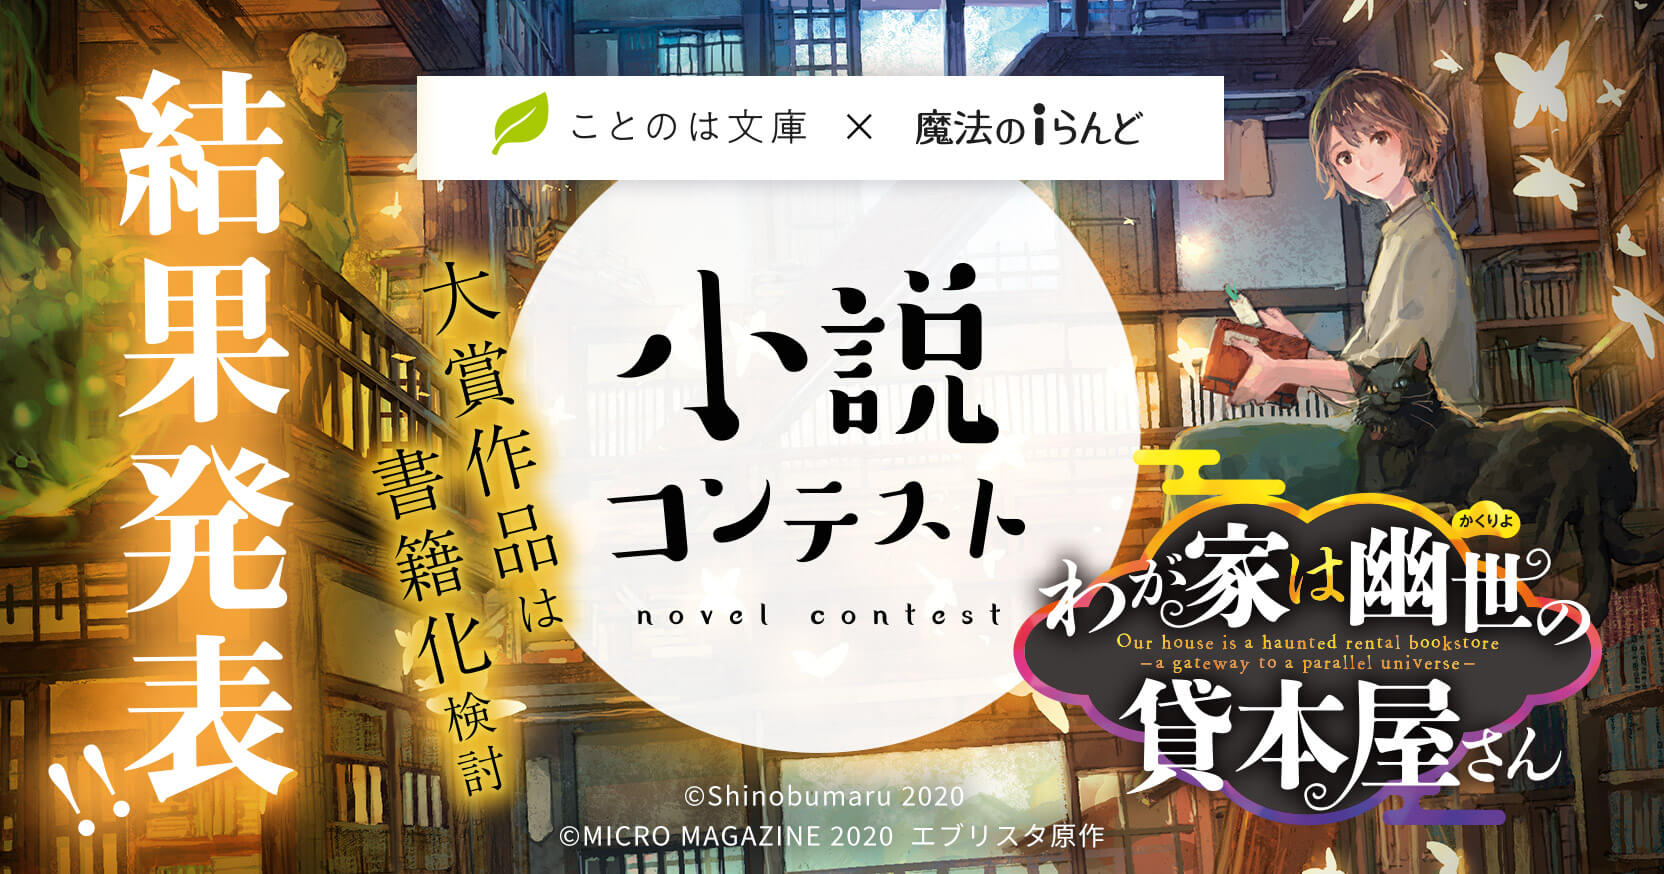 https://storage.googleapis.com/blog-info/entry/2021/05/210521-kotonoha_ogp.jpg